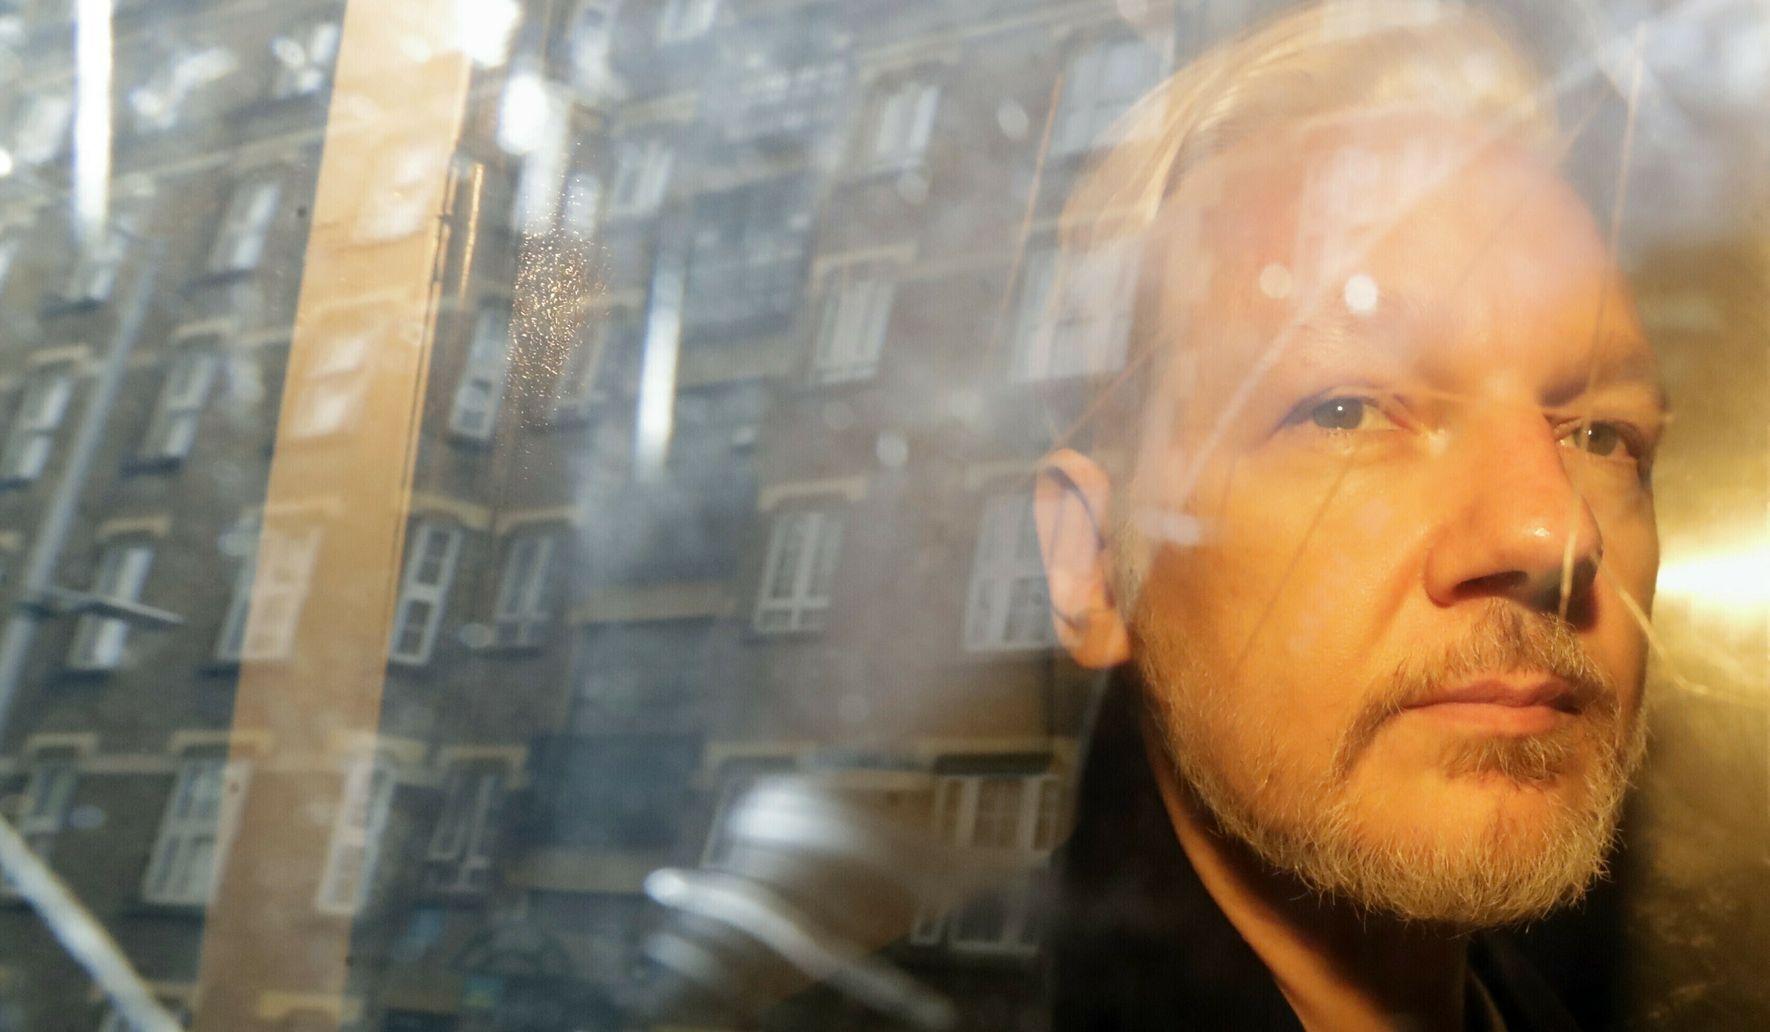 Doctors rip 'irresponsible' U.K. government for ignoring 'grave' concerns about Julian Assange